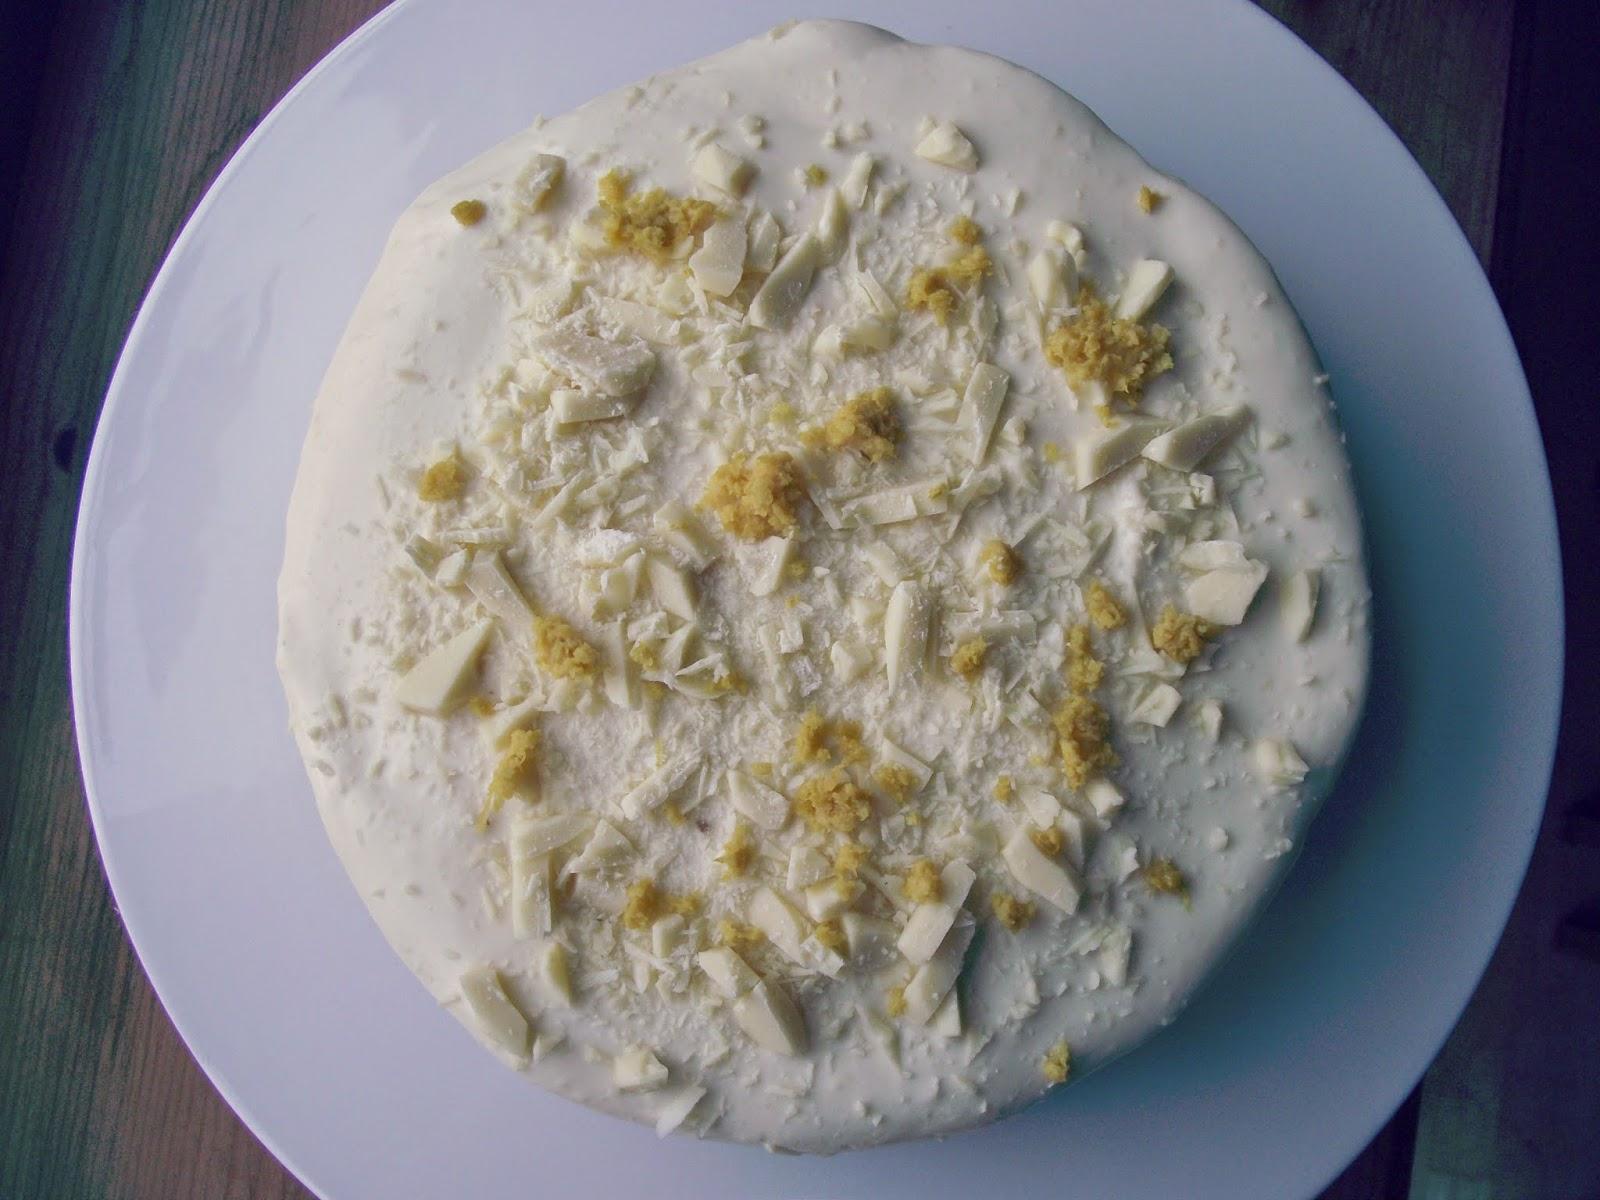 cheesecake,lemon,baking,food,recipe,easy